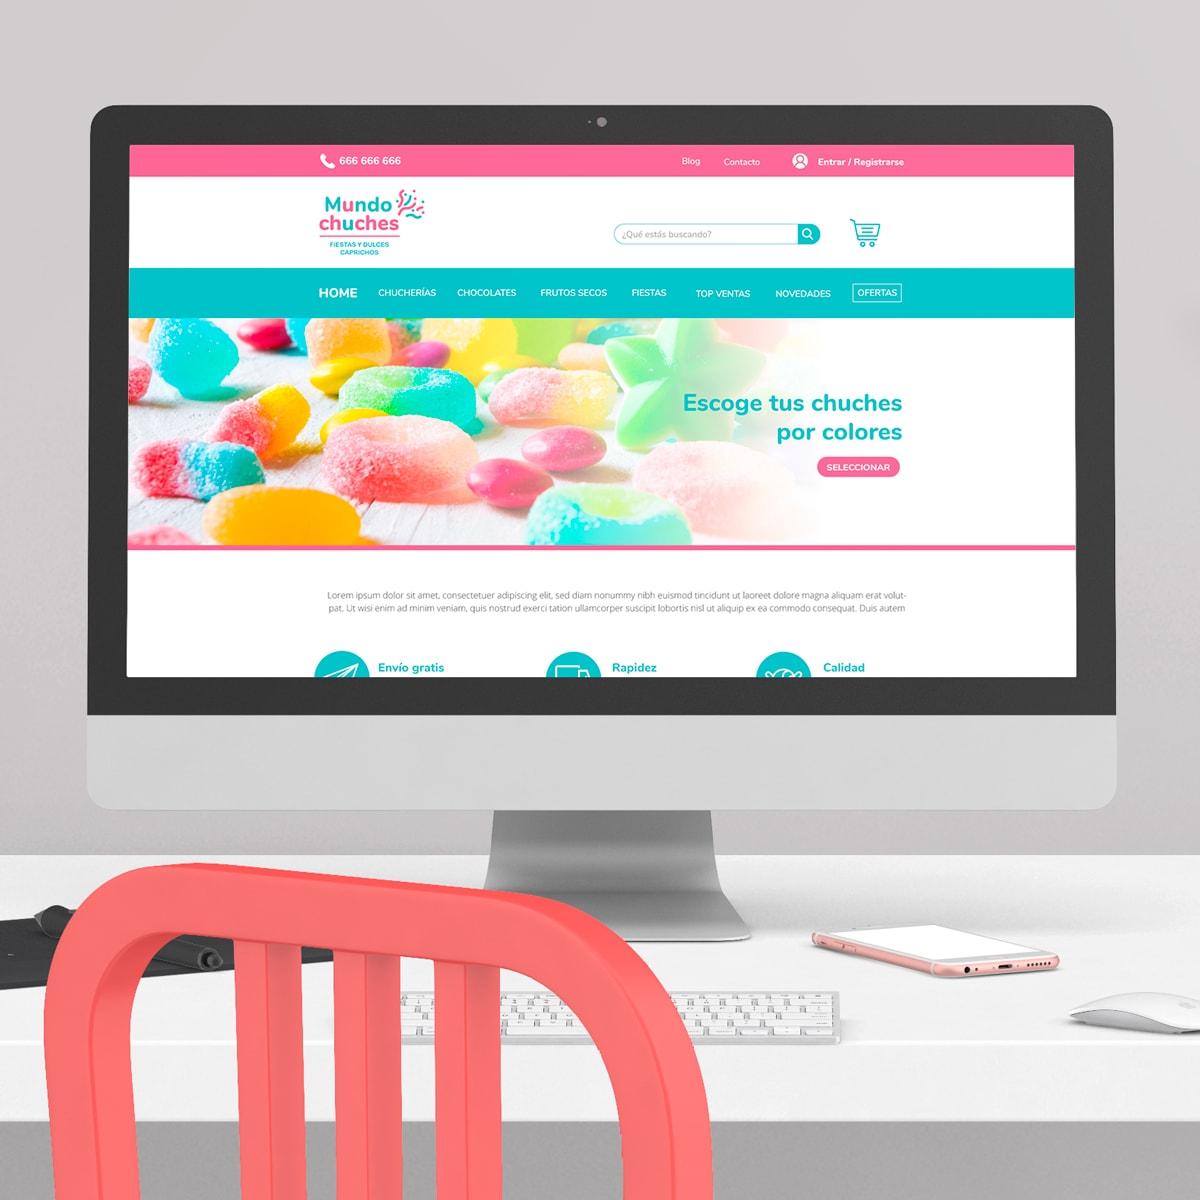 Diseño Web Zaragoza - Diseño páginas web  8fcb8b03ef9b2